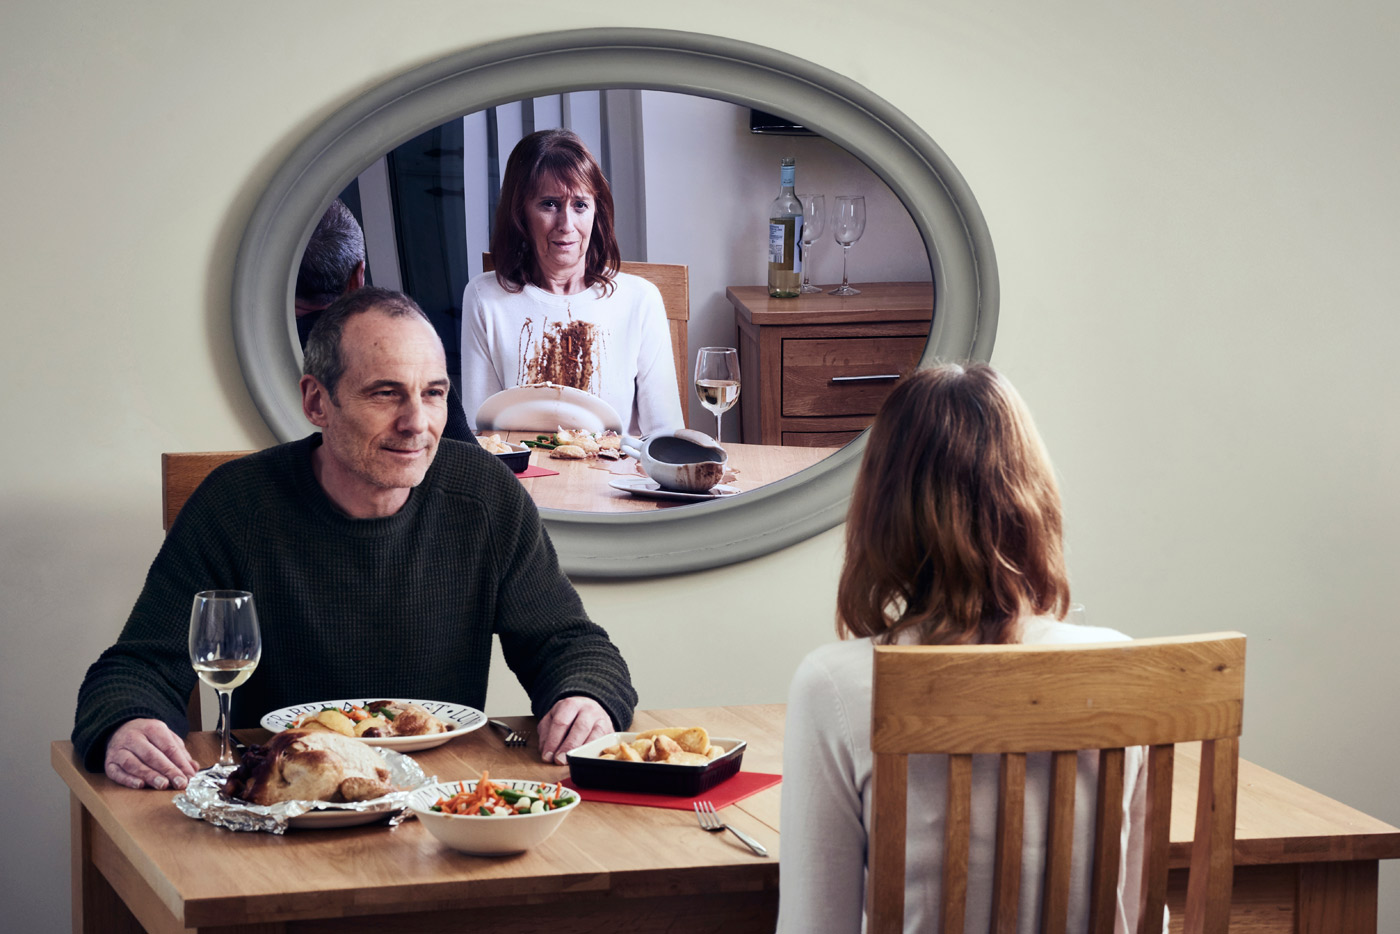 Essex Police Reflect campaign